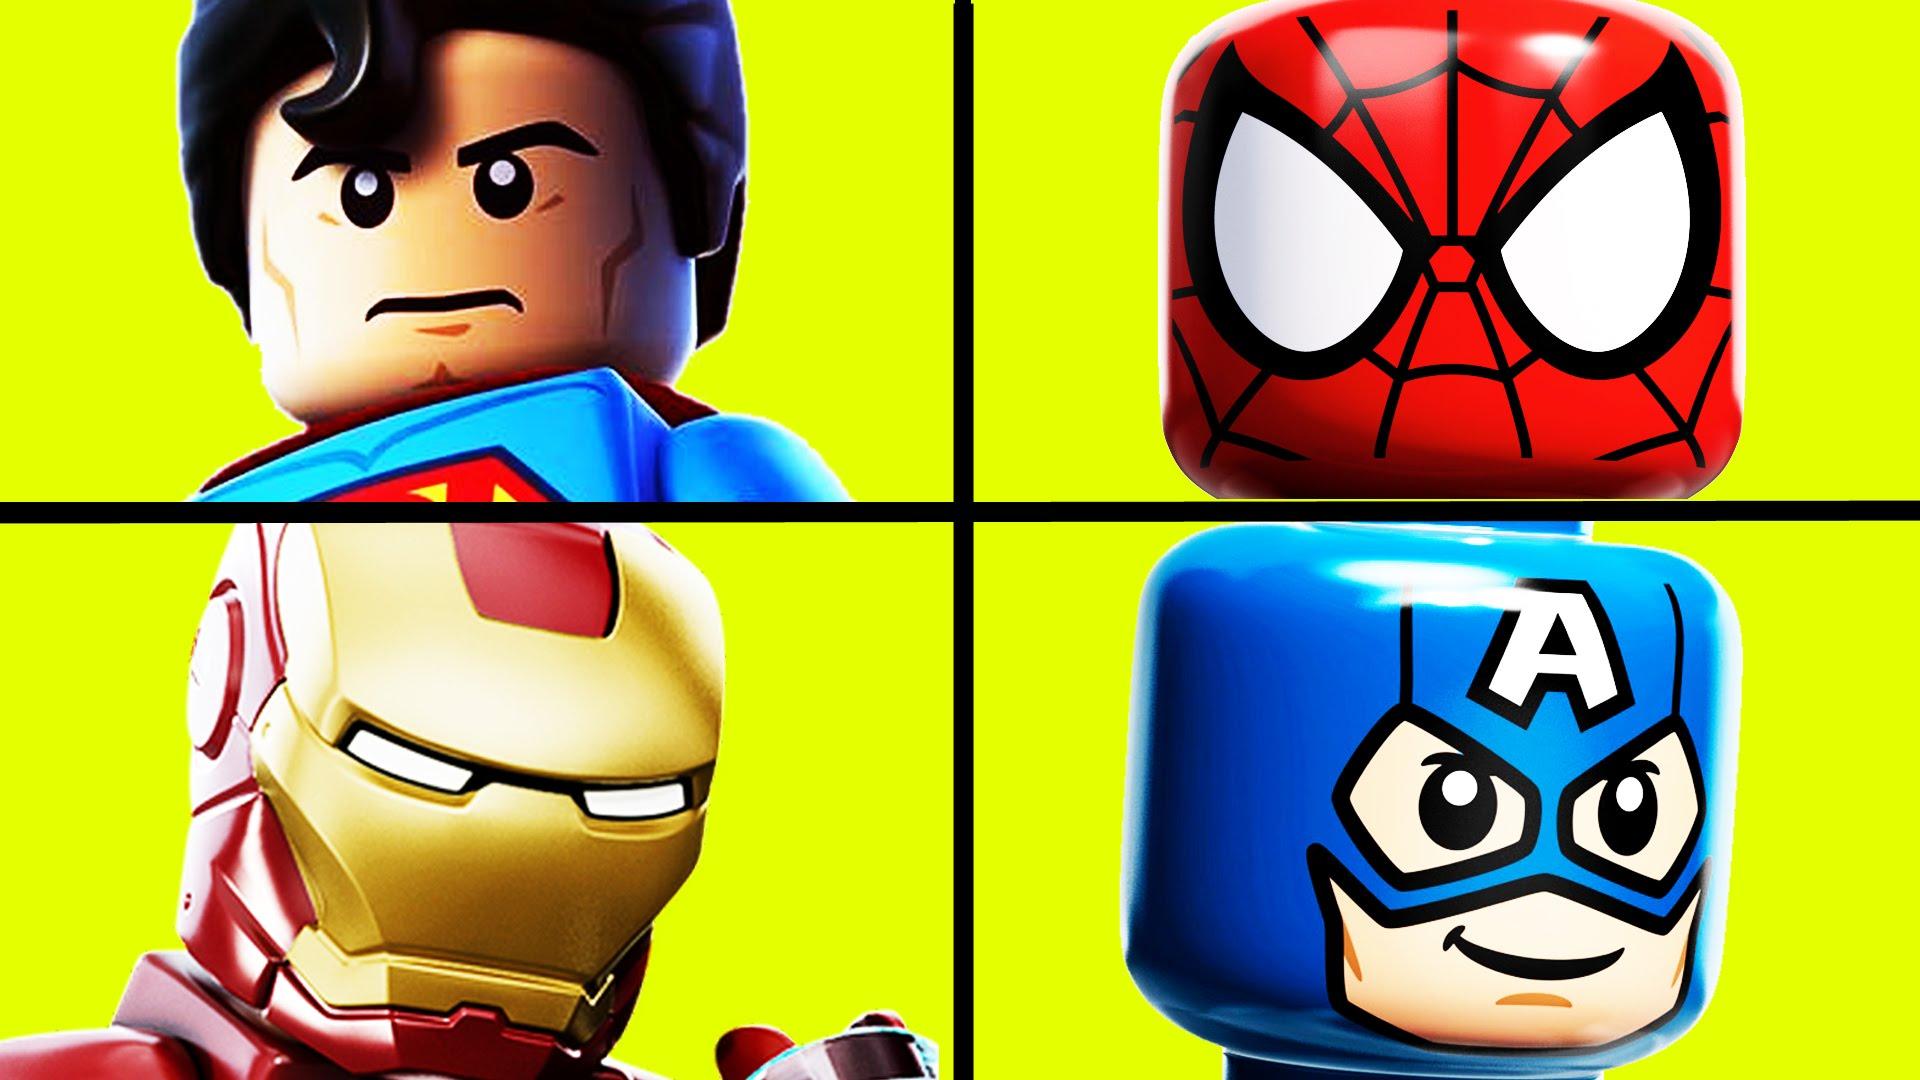 Lego clipart superman cartoon LEGO Superman Superman Batman Lego